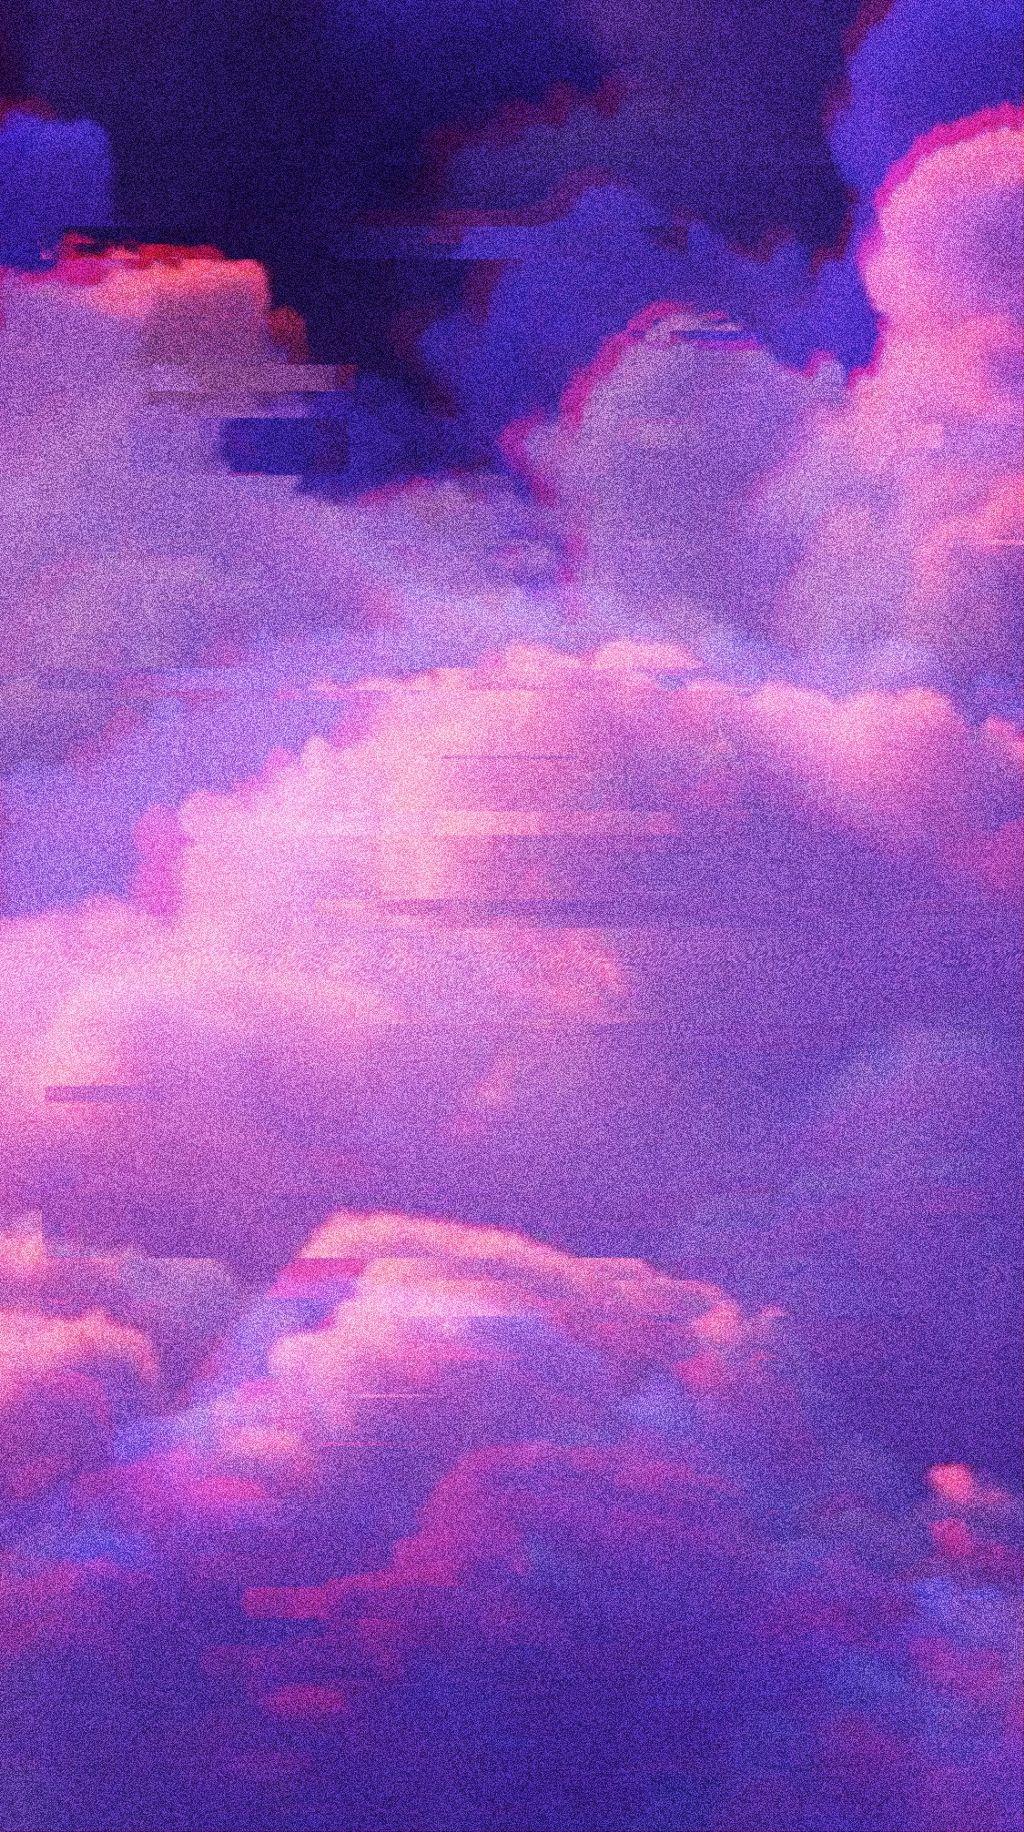 Free Aesthetic Glitch Cloud Background Wallpaper Gli